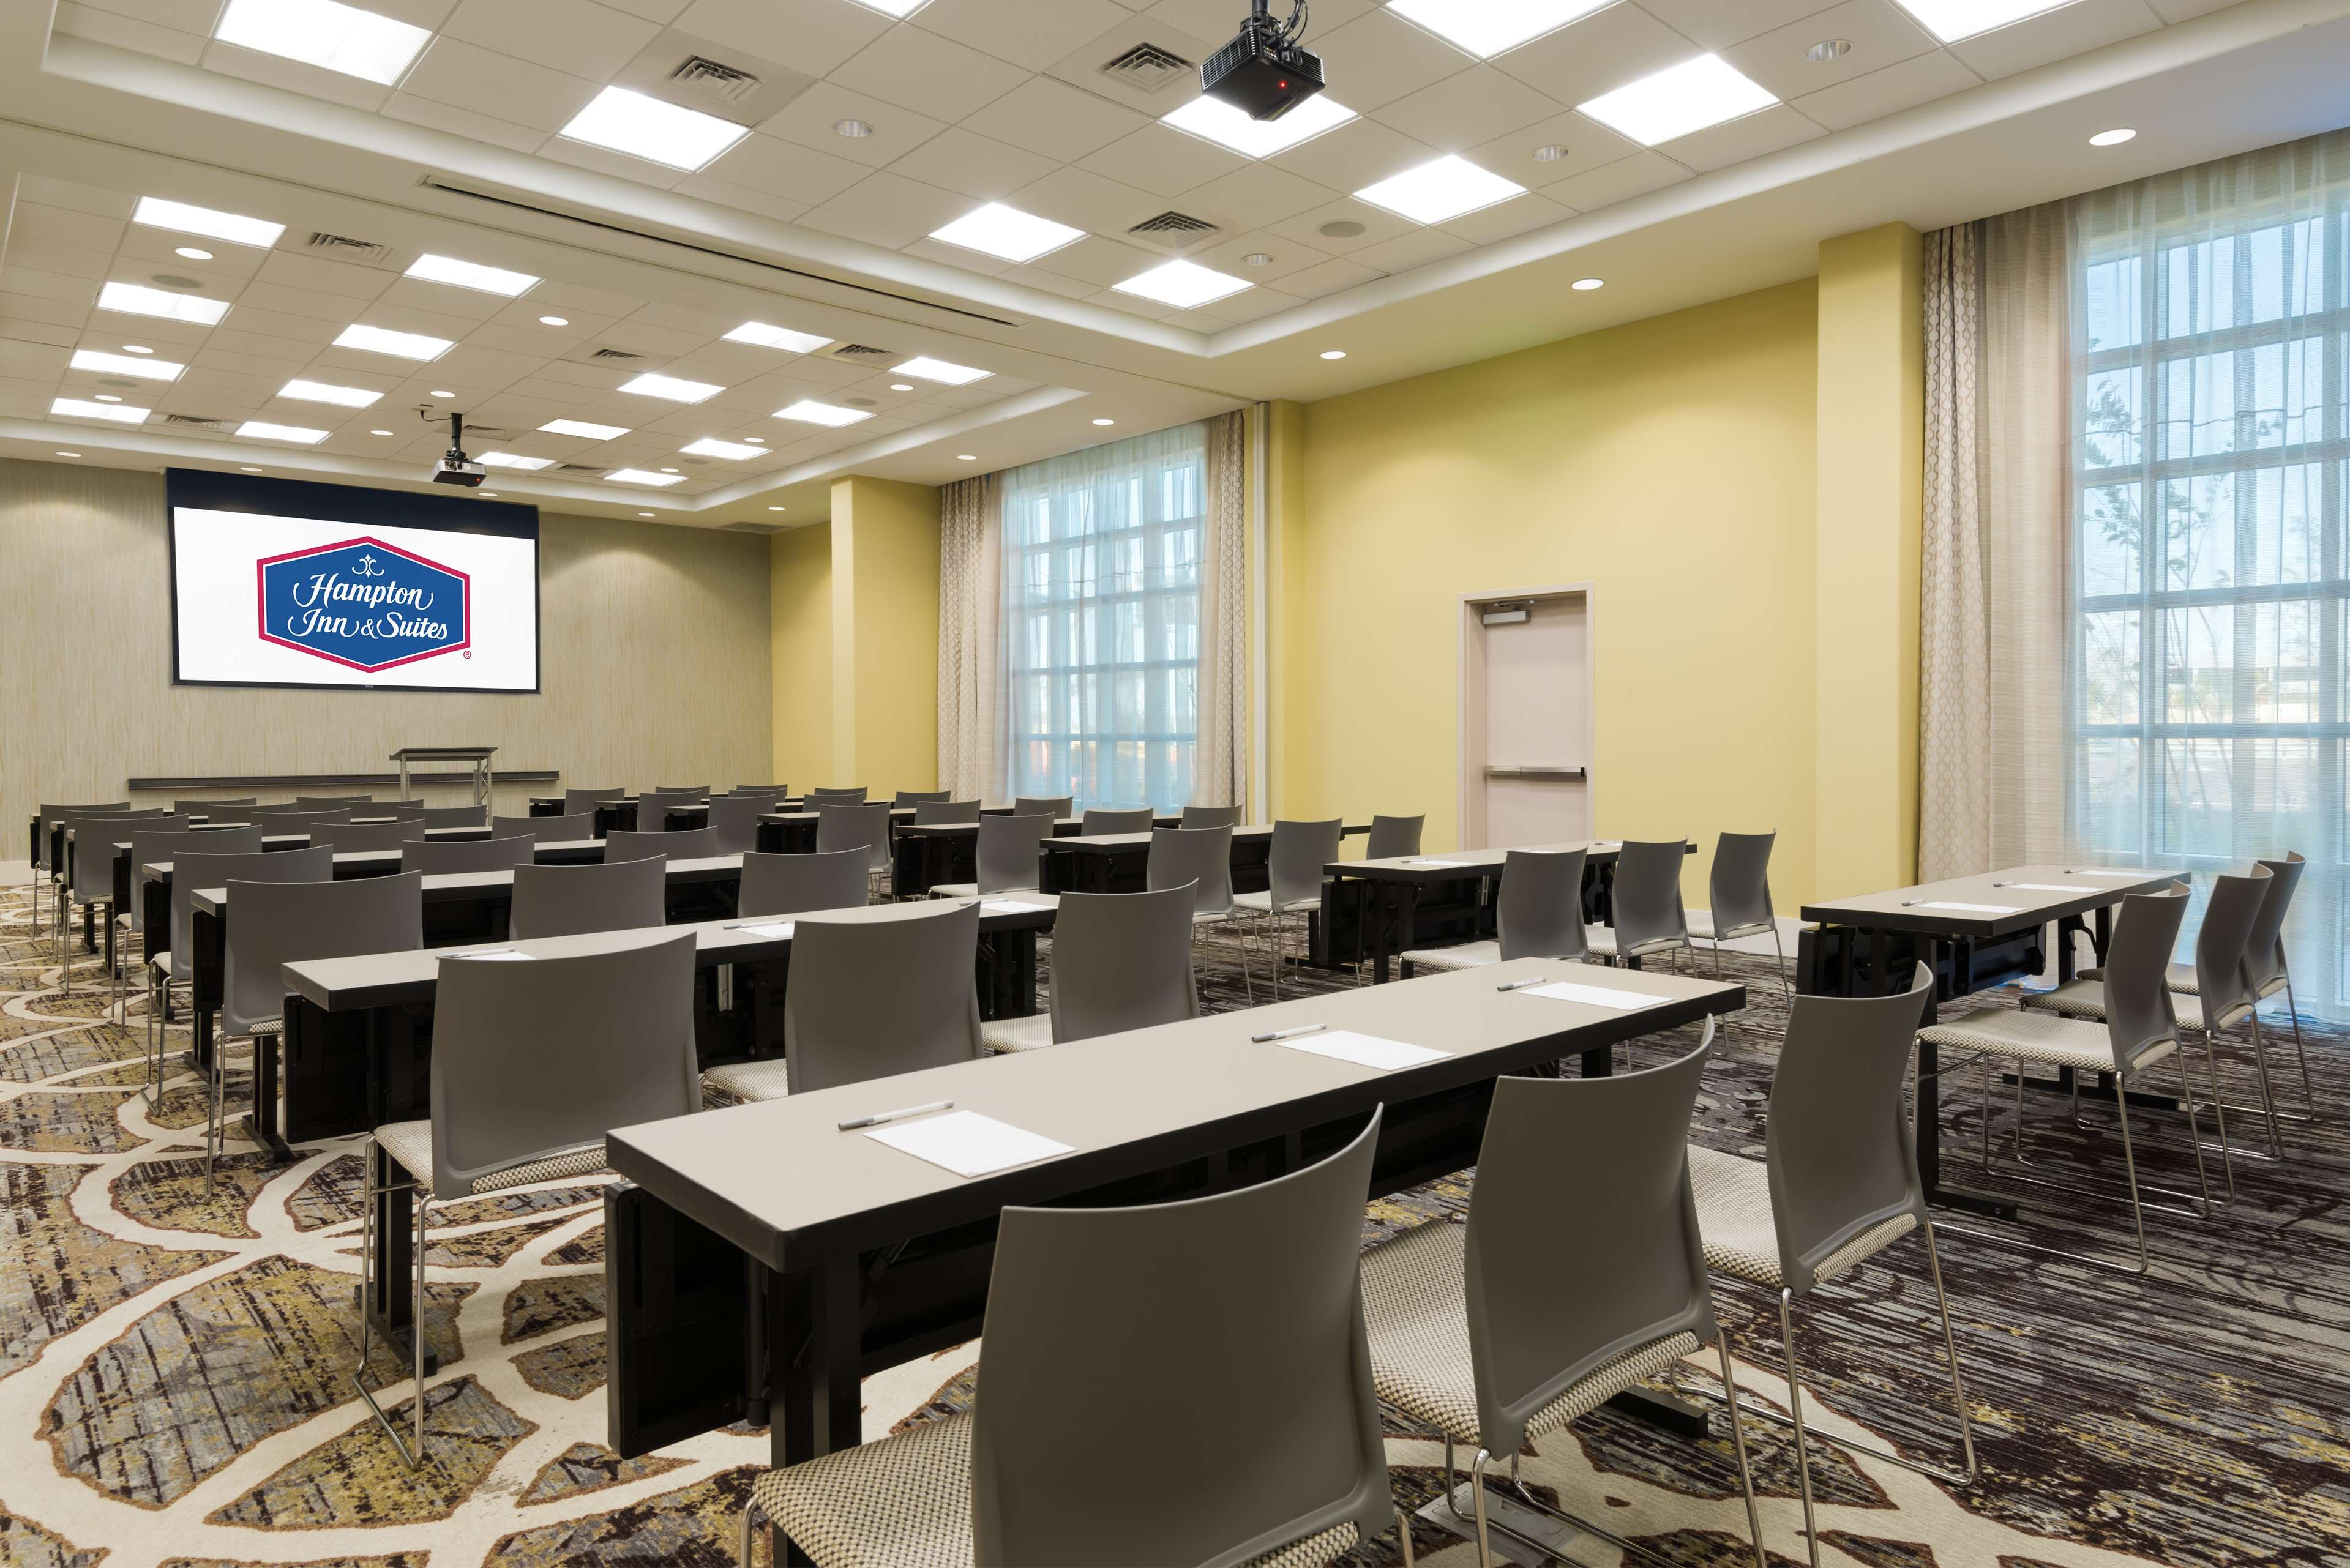 Hampton Inn & Suites Tampa Airport Avion Park Westshore image 29